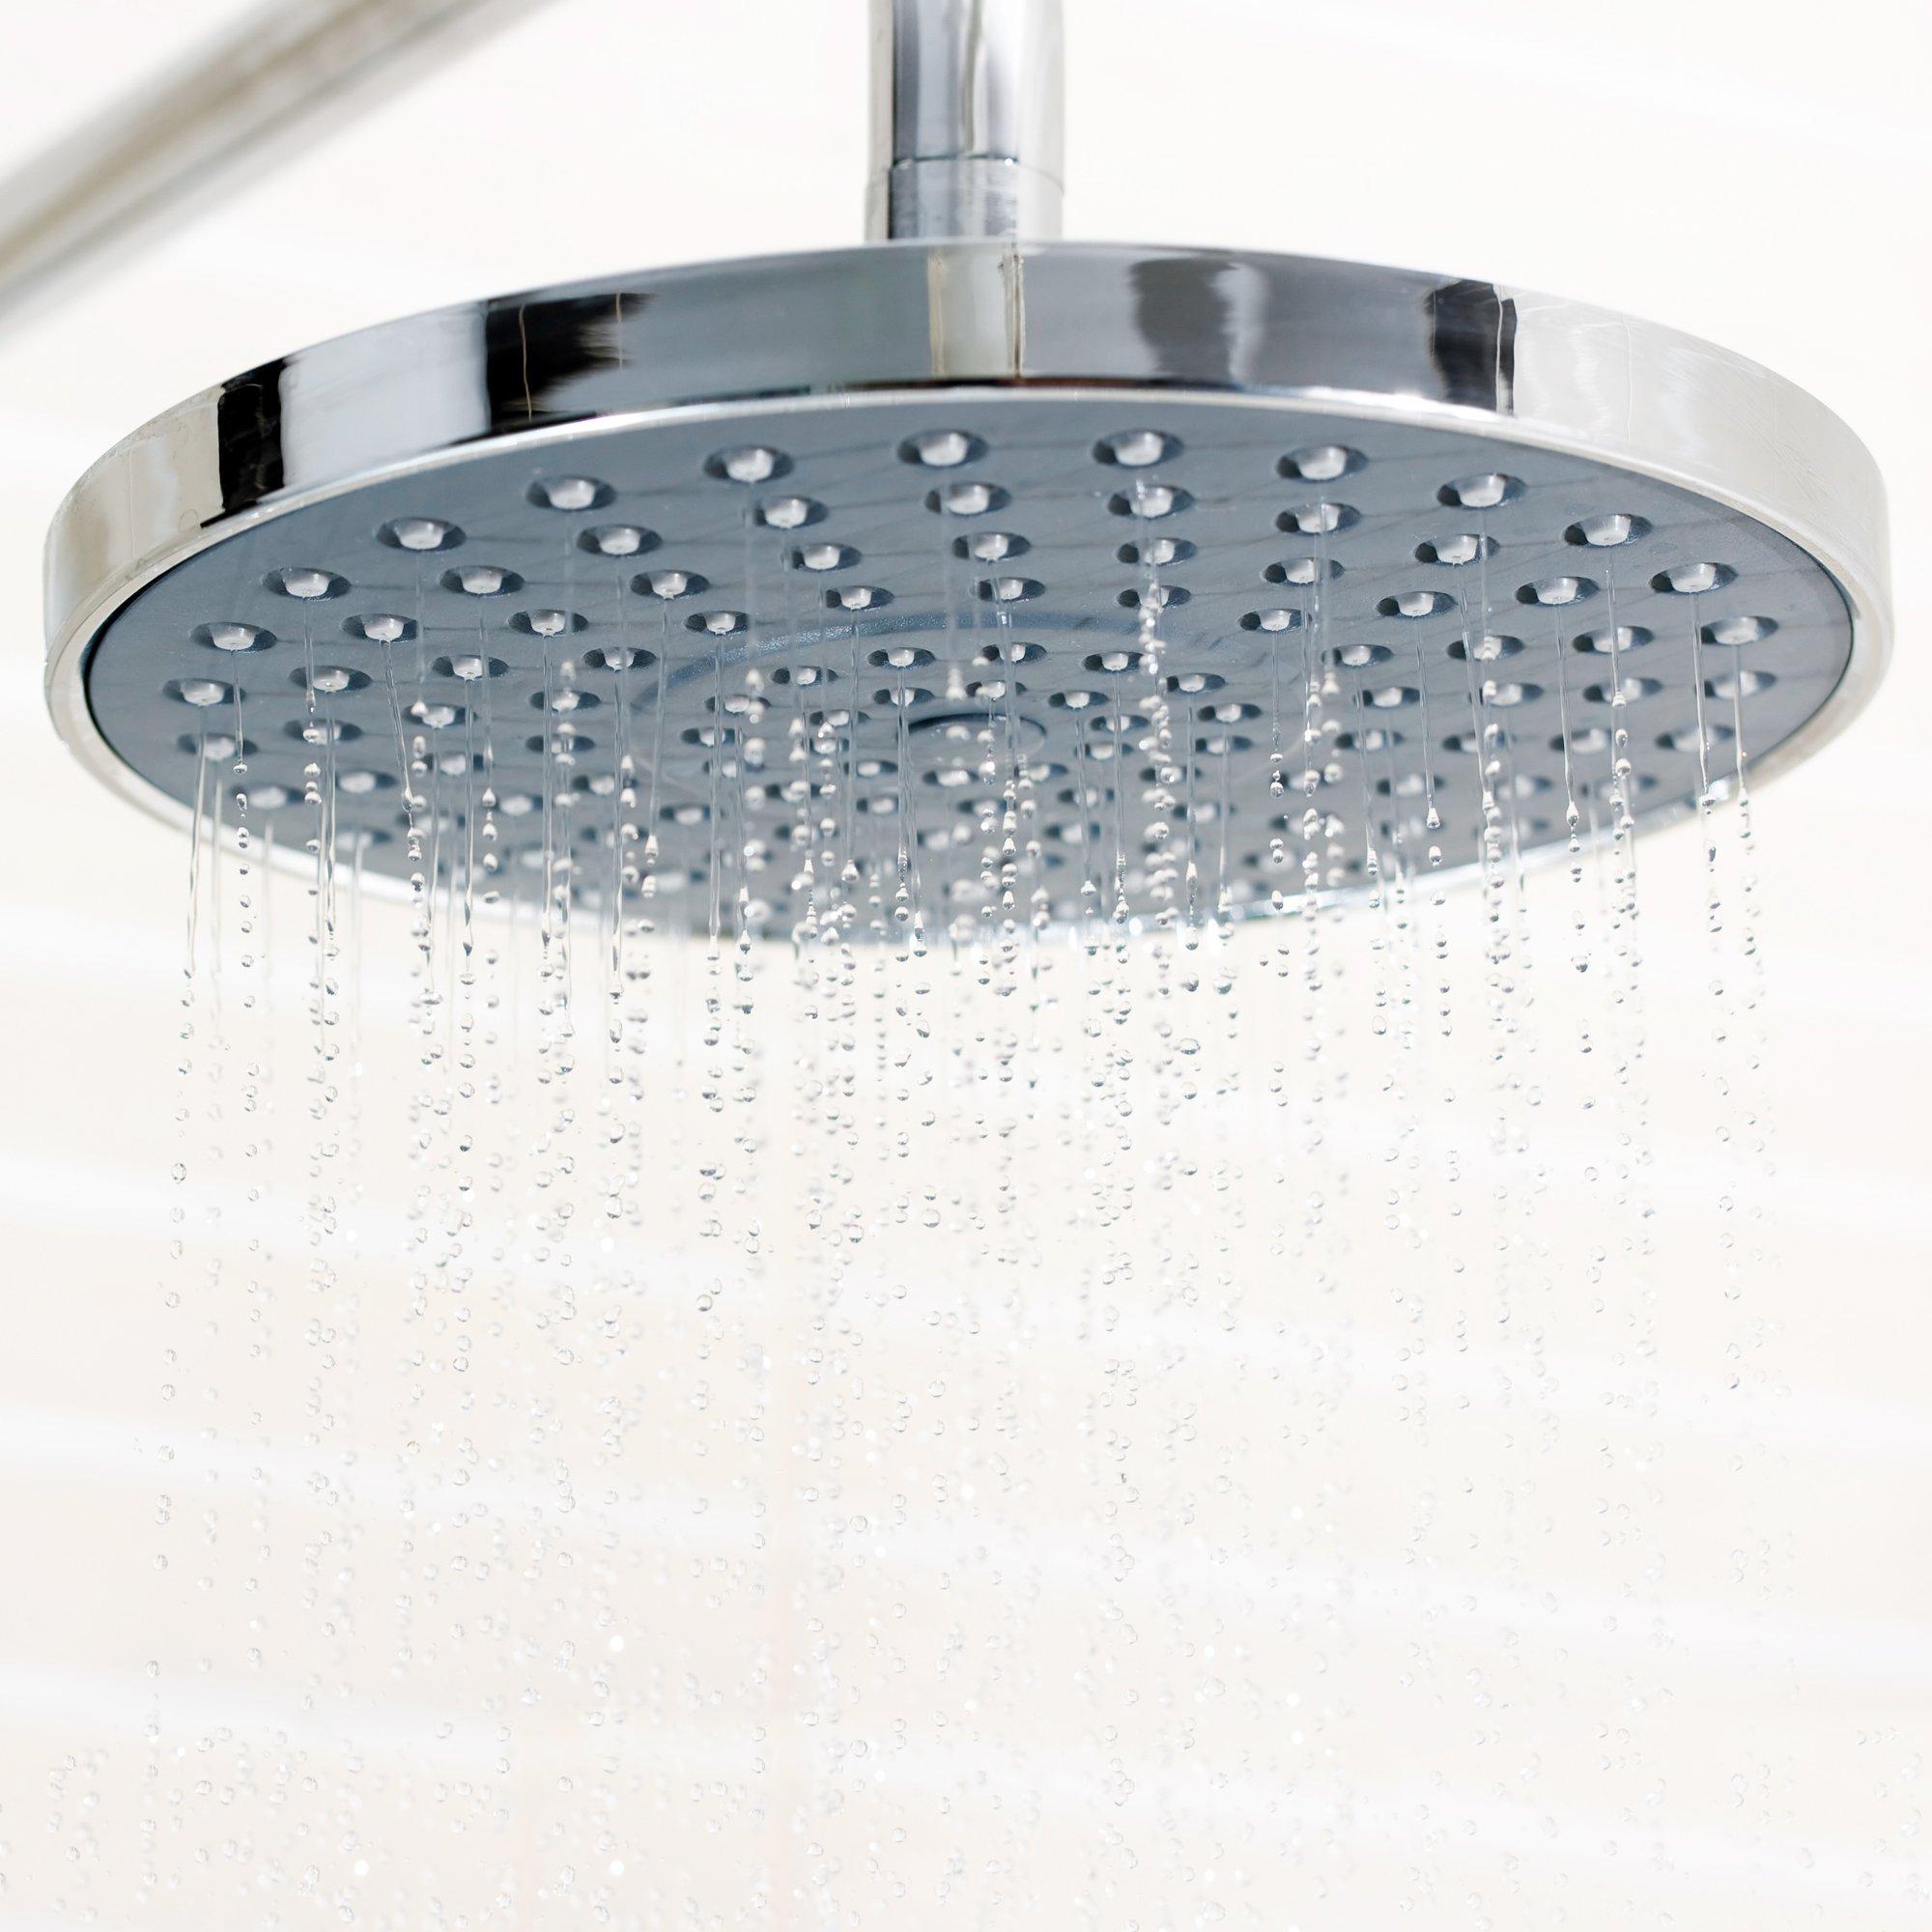 waterfall shower en antoniolupi lastra al copia design bilastra and products showerheads head